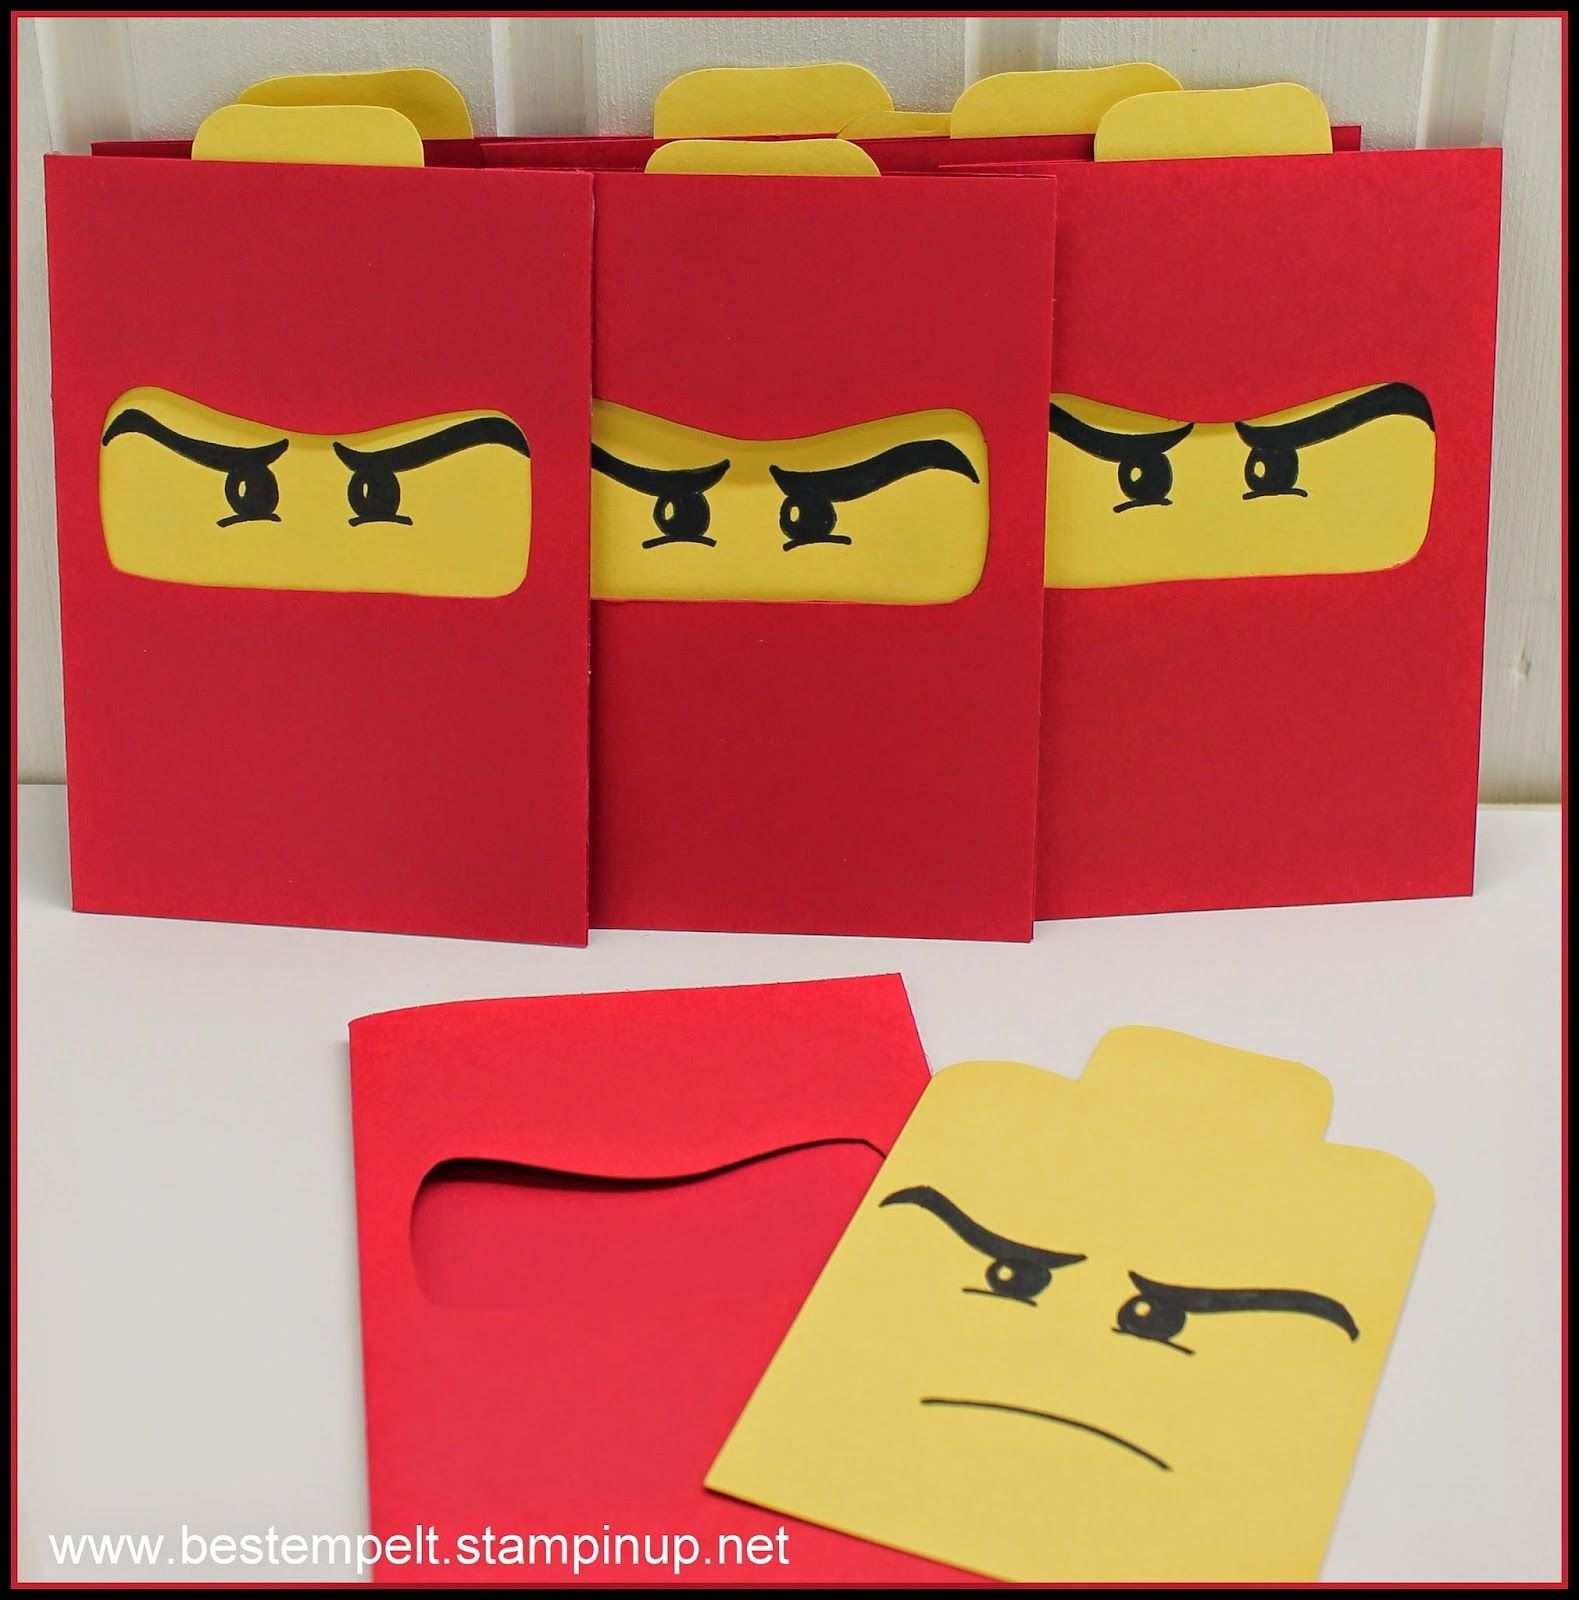 Lego Ninja Kindergeburtstag Einladungskarten Selber Mach Einladungskarten Kindergeburtstag Einladungskarten Kindergeburtstag Basteln Einladung Kindergeburtstag